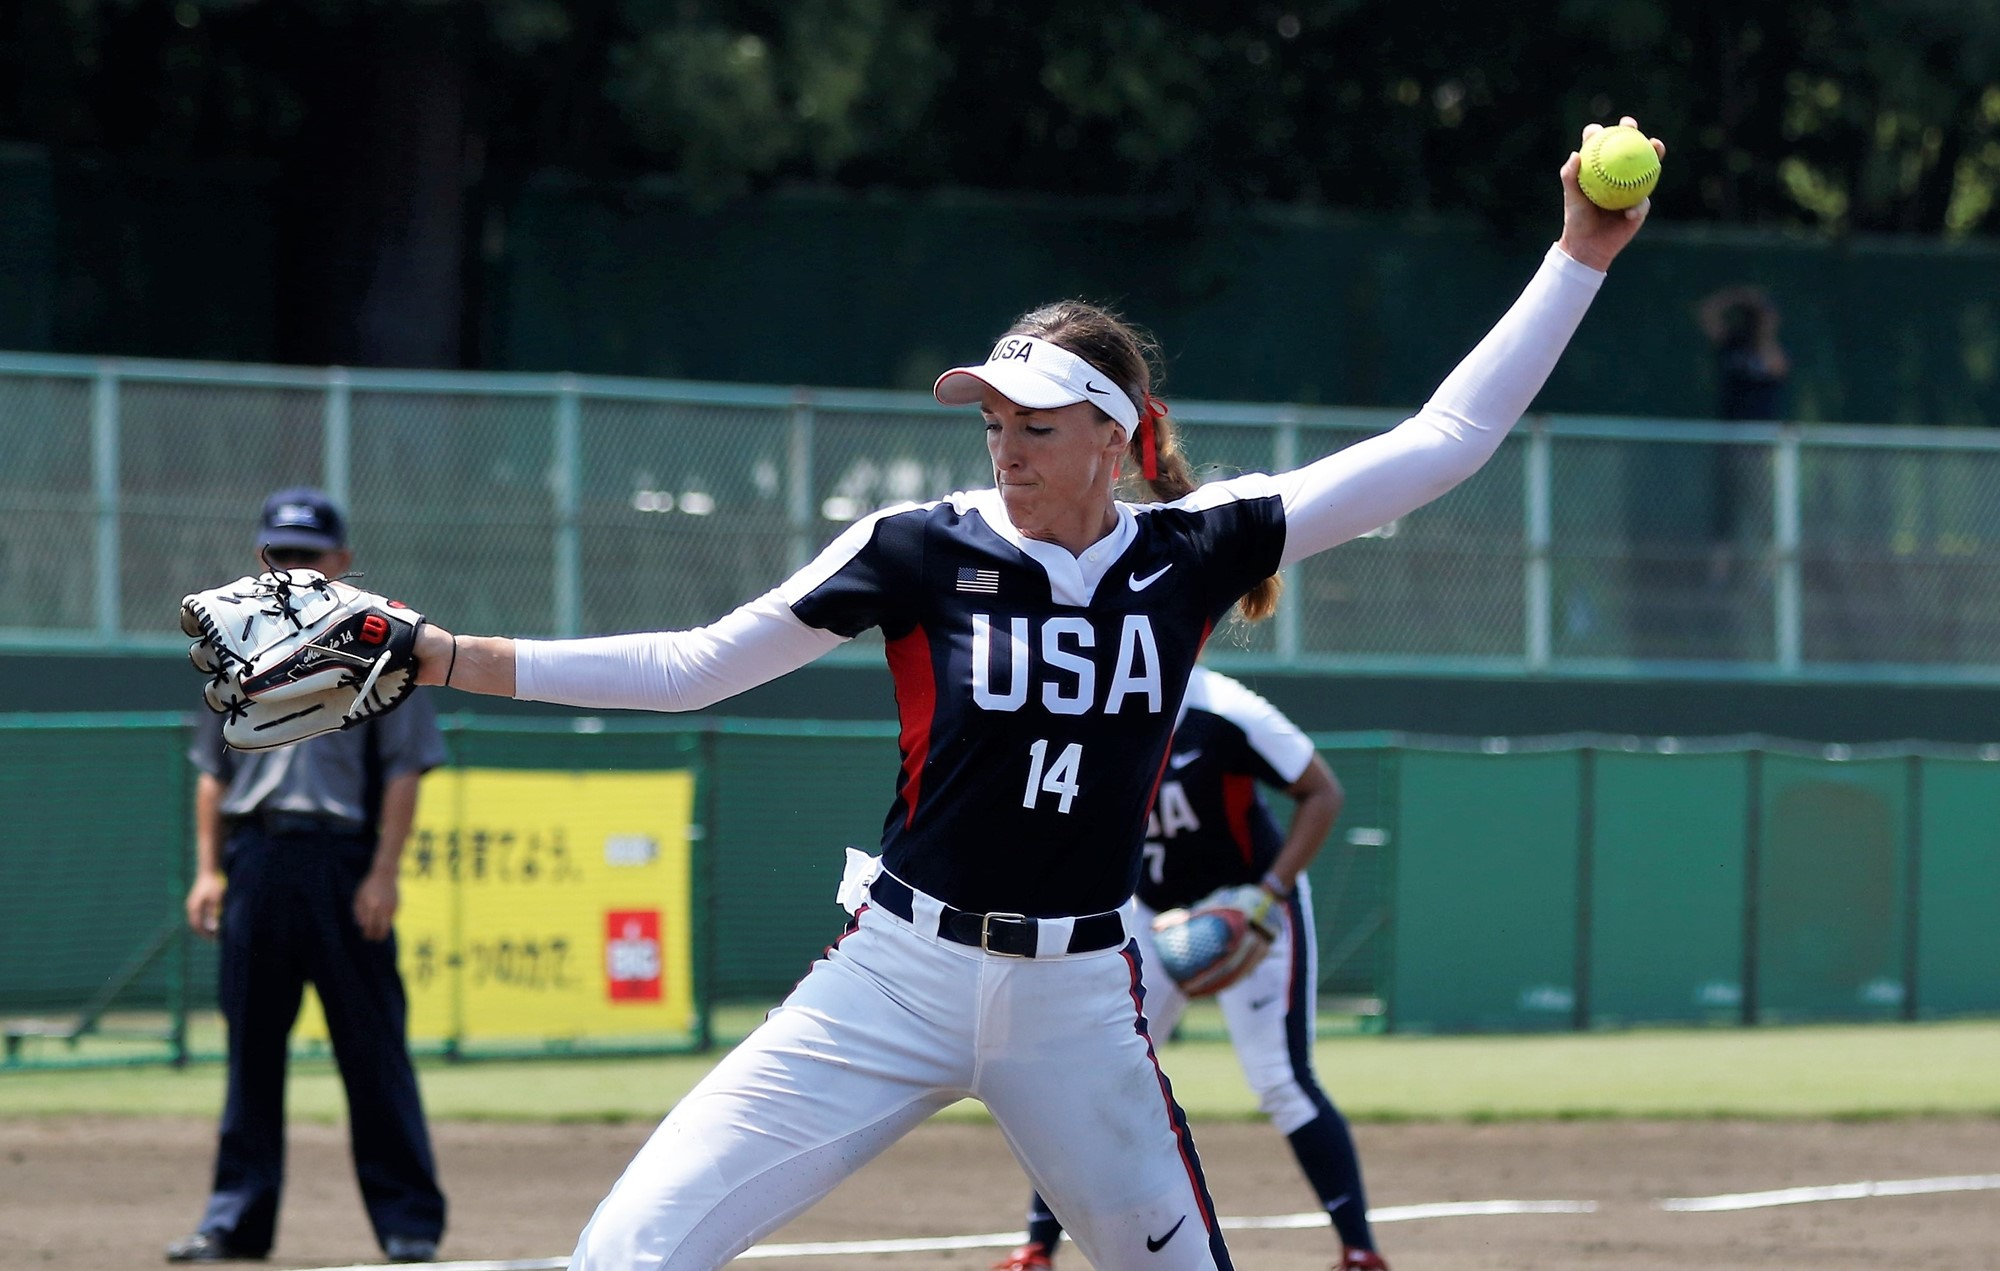 USA star pitcher Monica Abbott